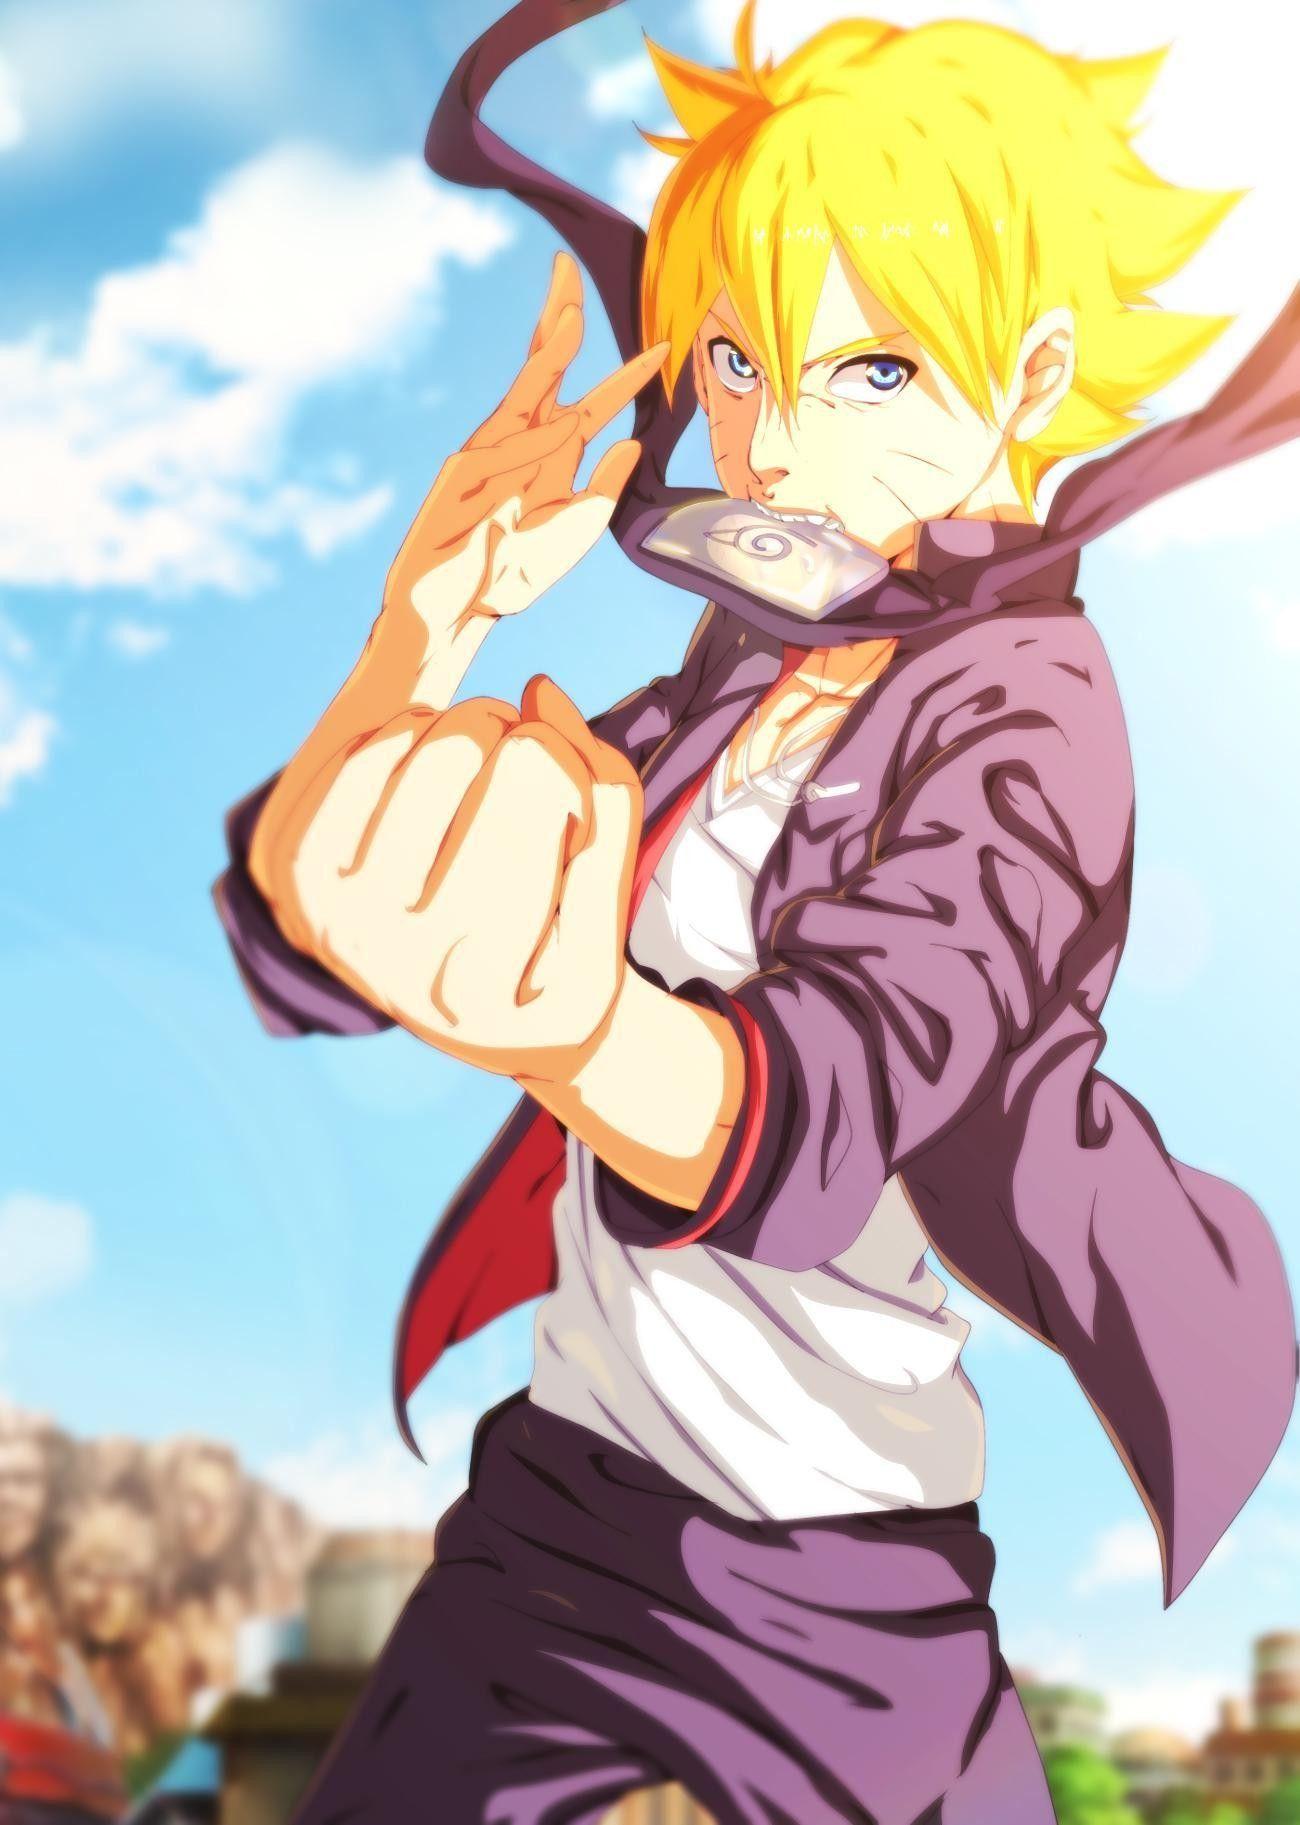 Pin de 4иιмєχ ¢нαииєℓχ em Boruto Naruto Next Generation